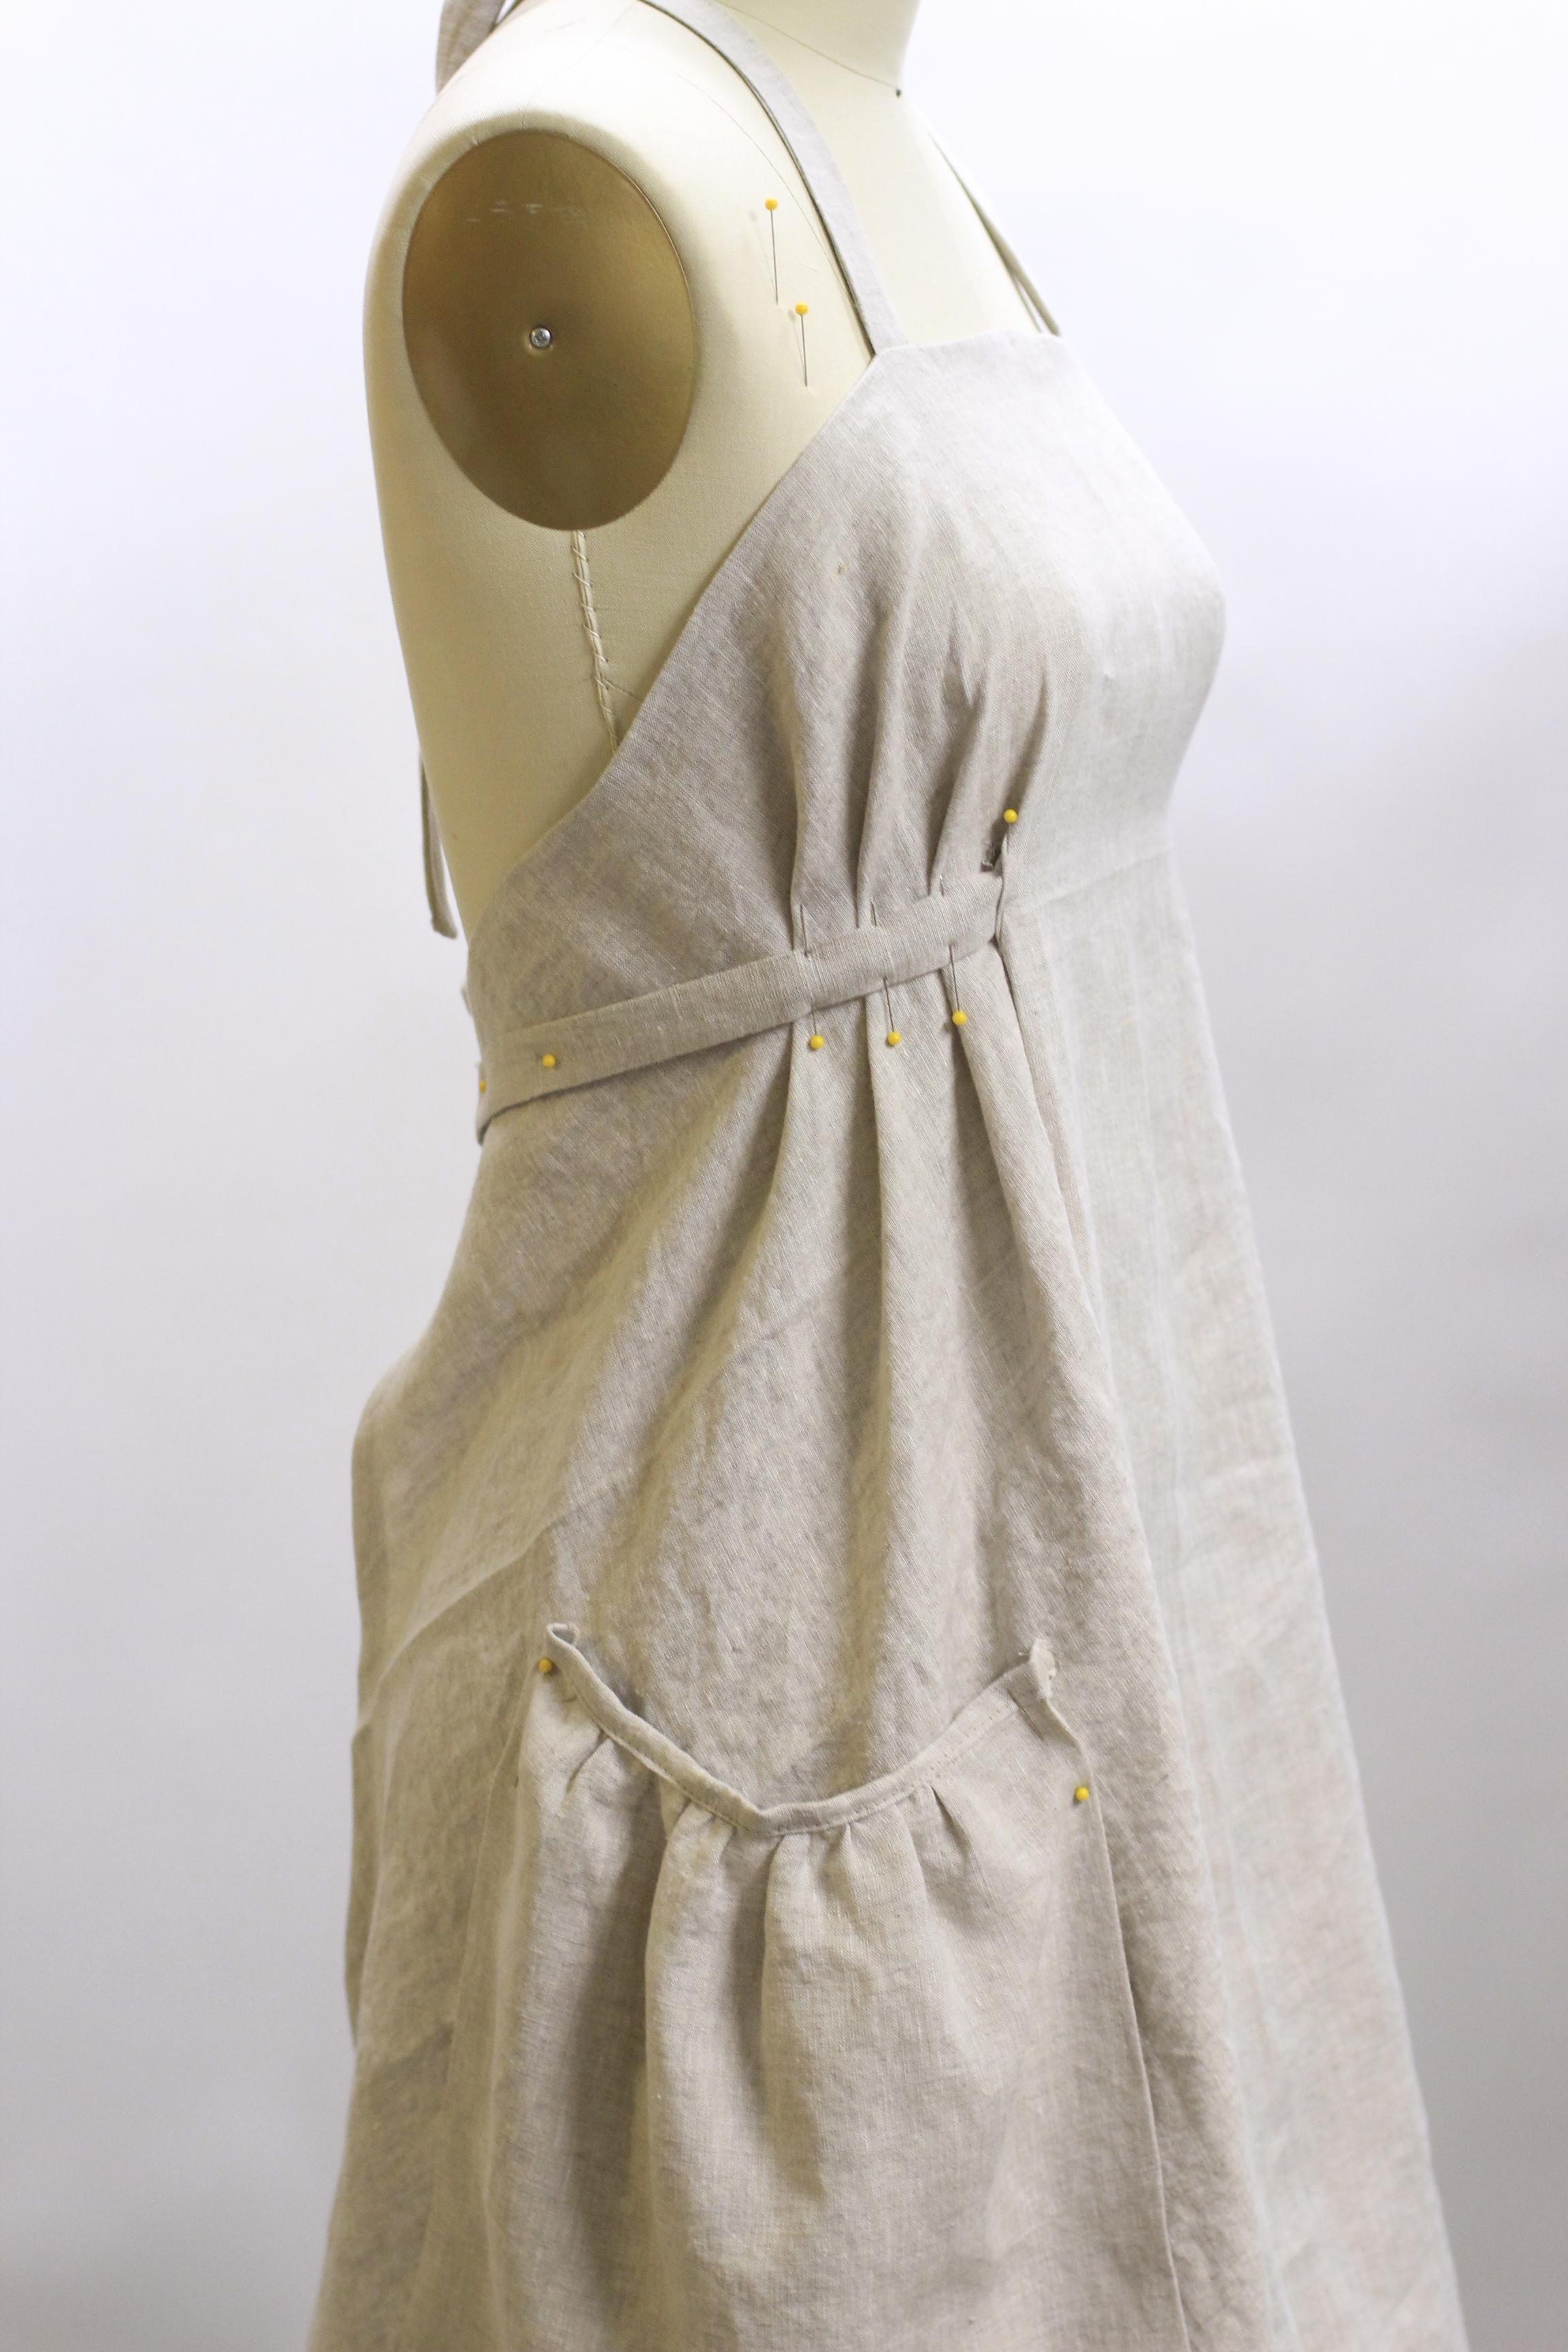 White linen apron - Vermont Apron Company 067